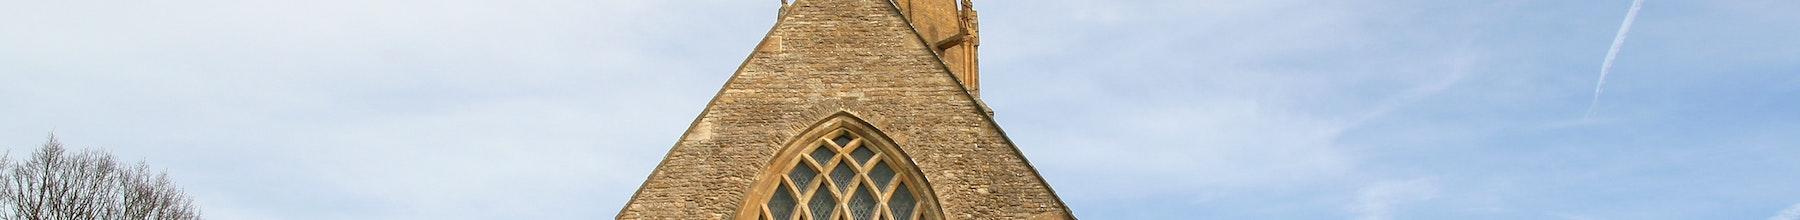 Church of St Mary, Bampton